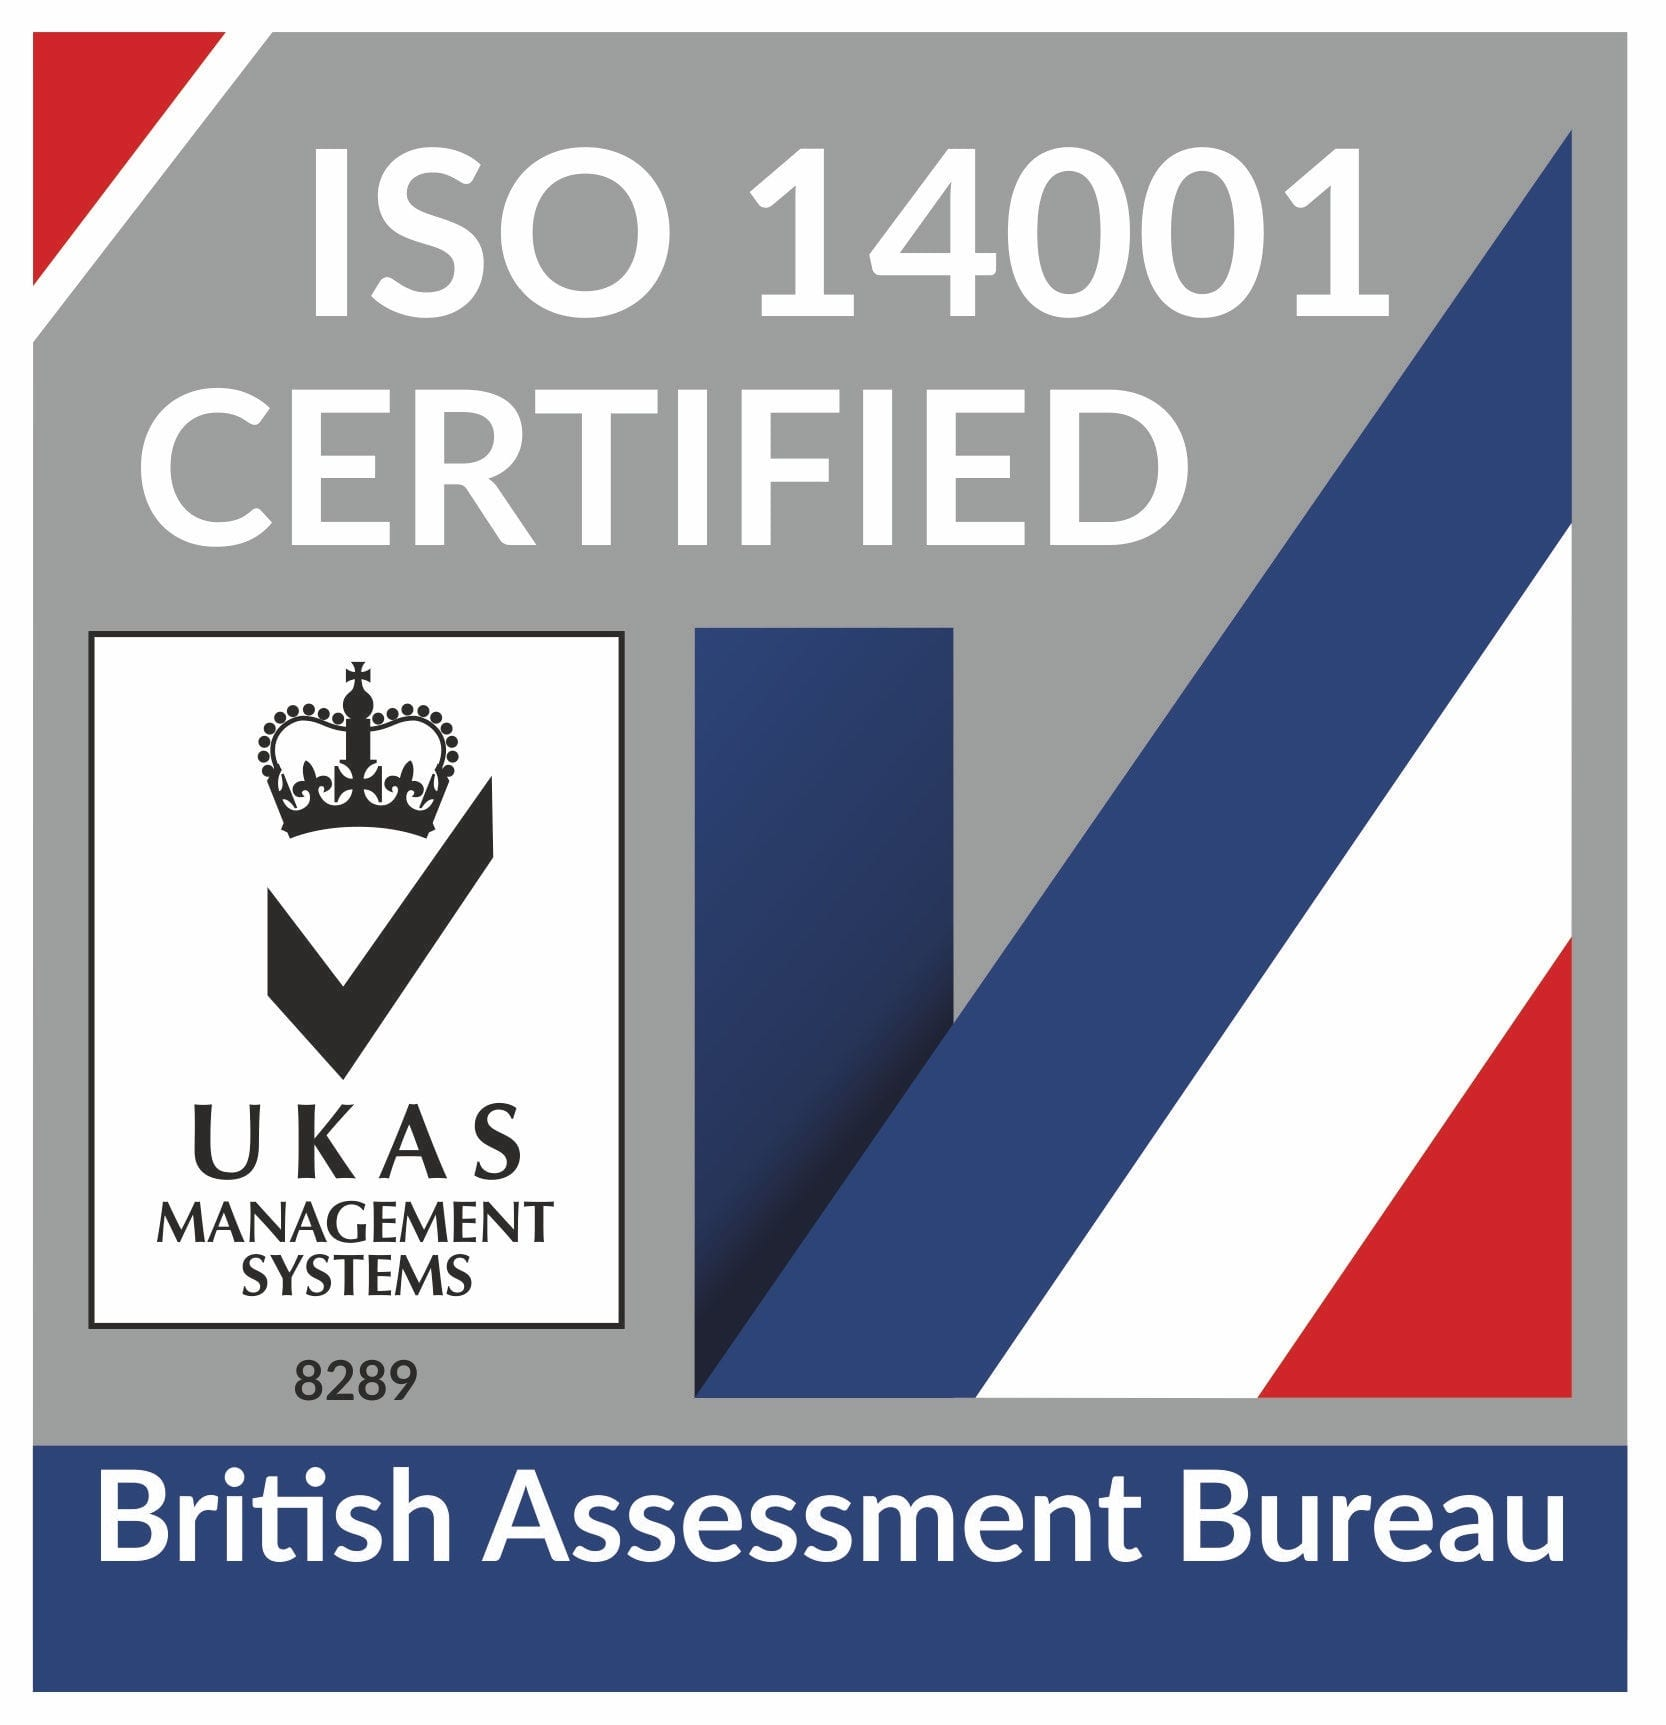 ISO-14001-UKAS